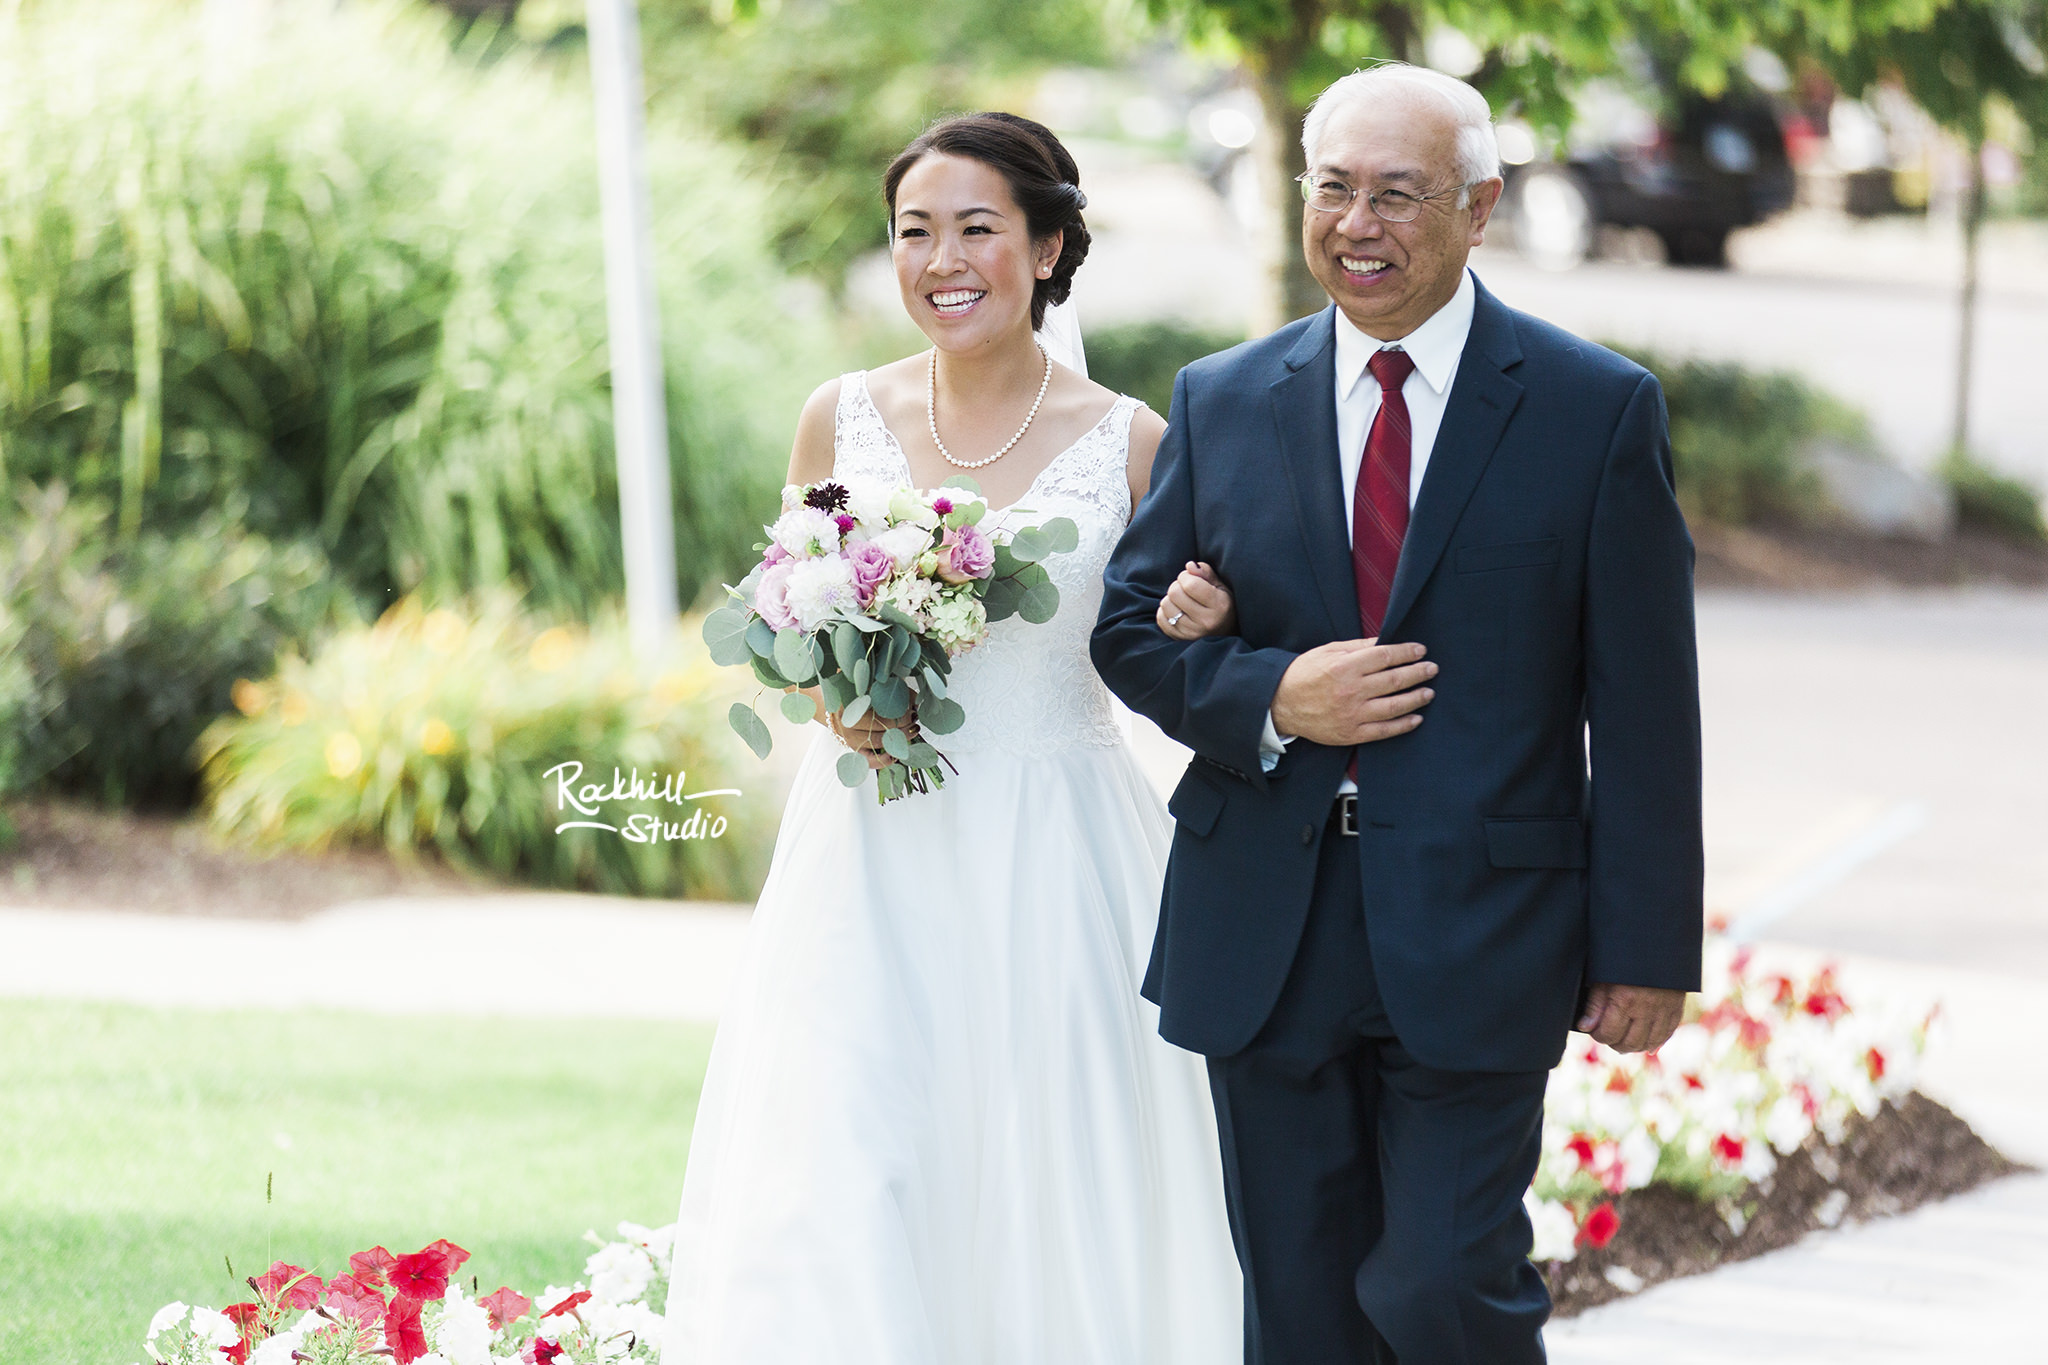 Northport wedding ceremony, bride walking down the isle, traverse city wedding photographer rockhill studio